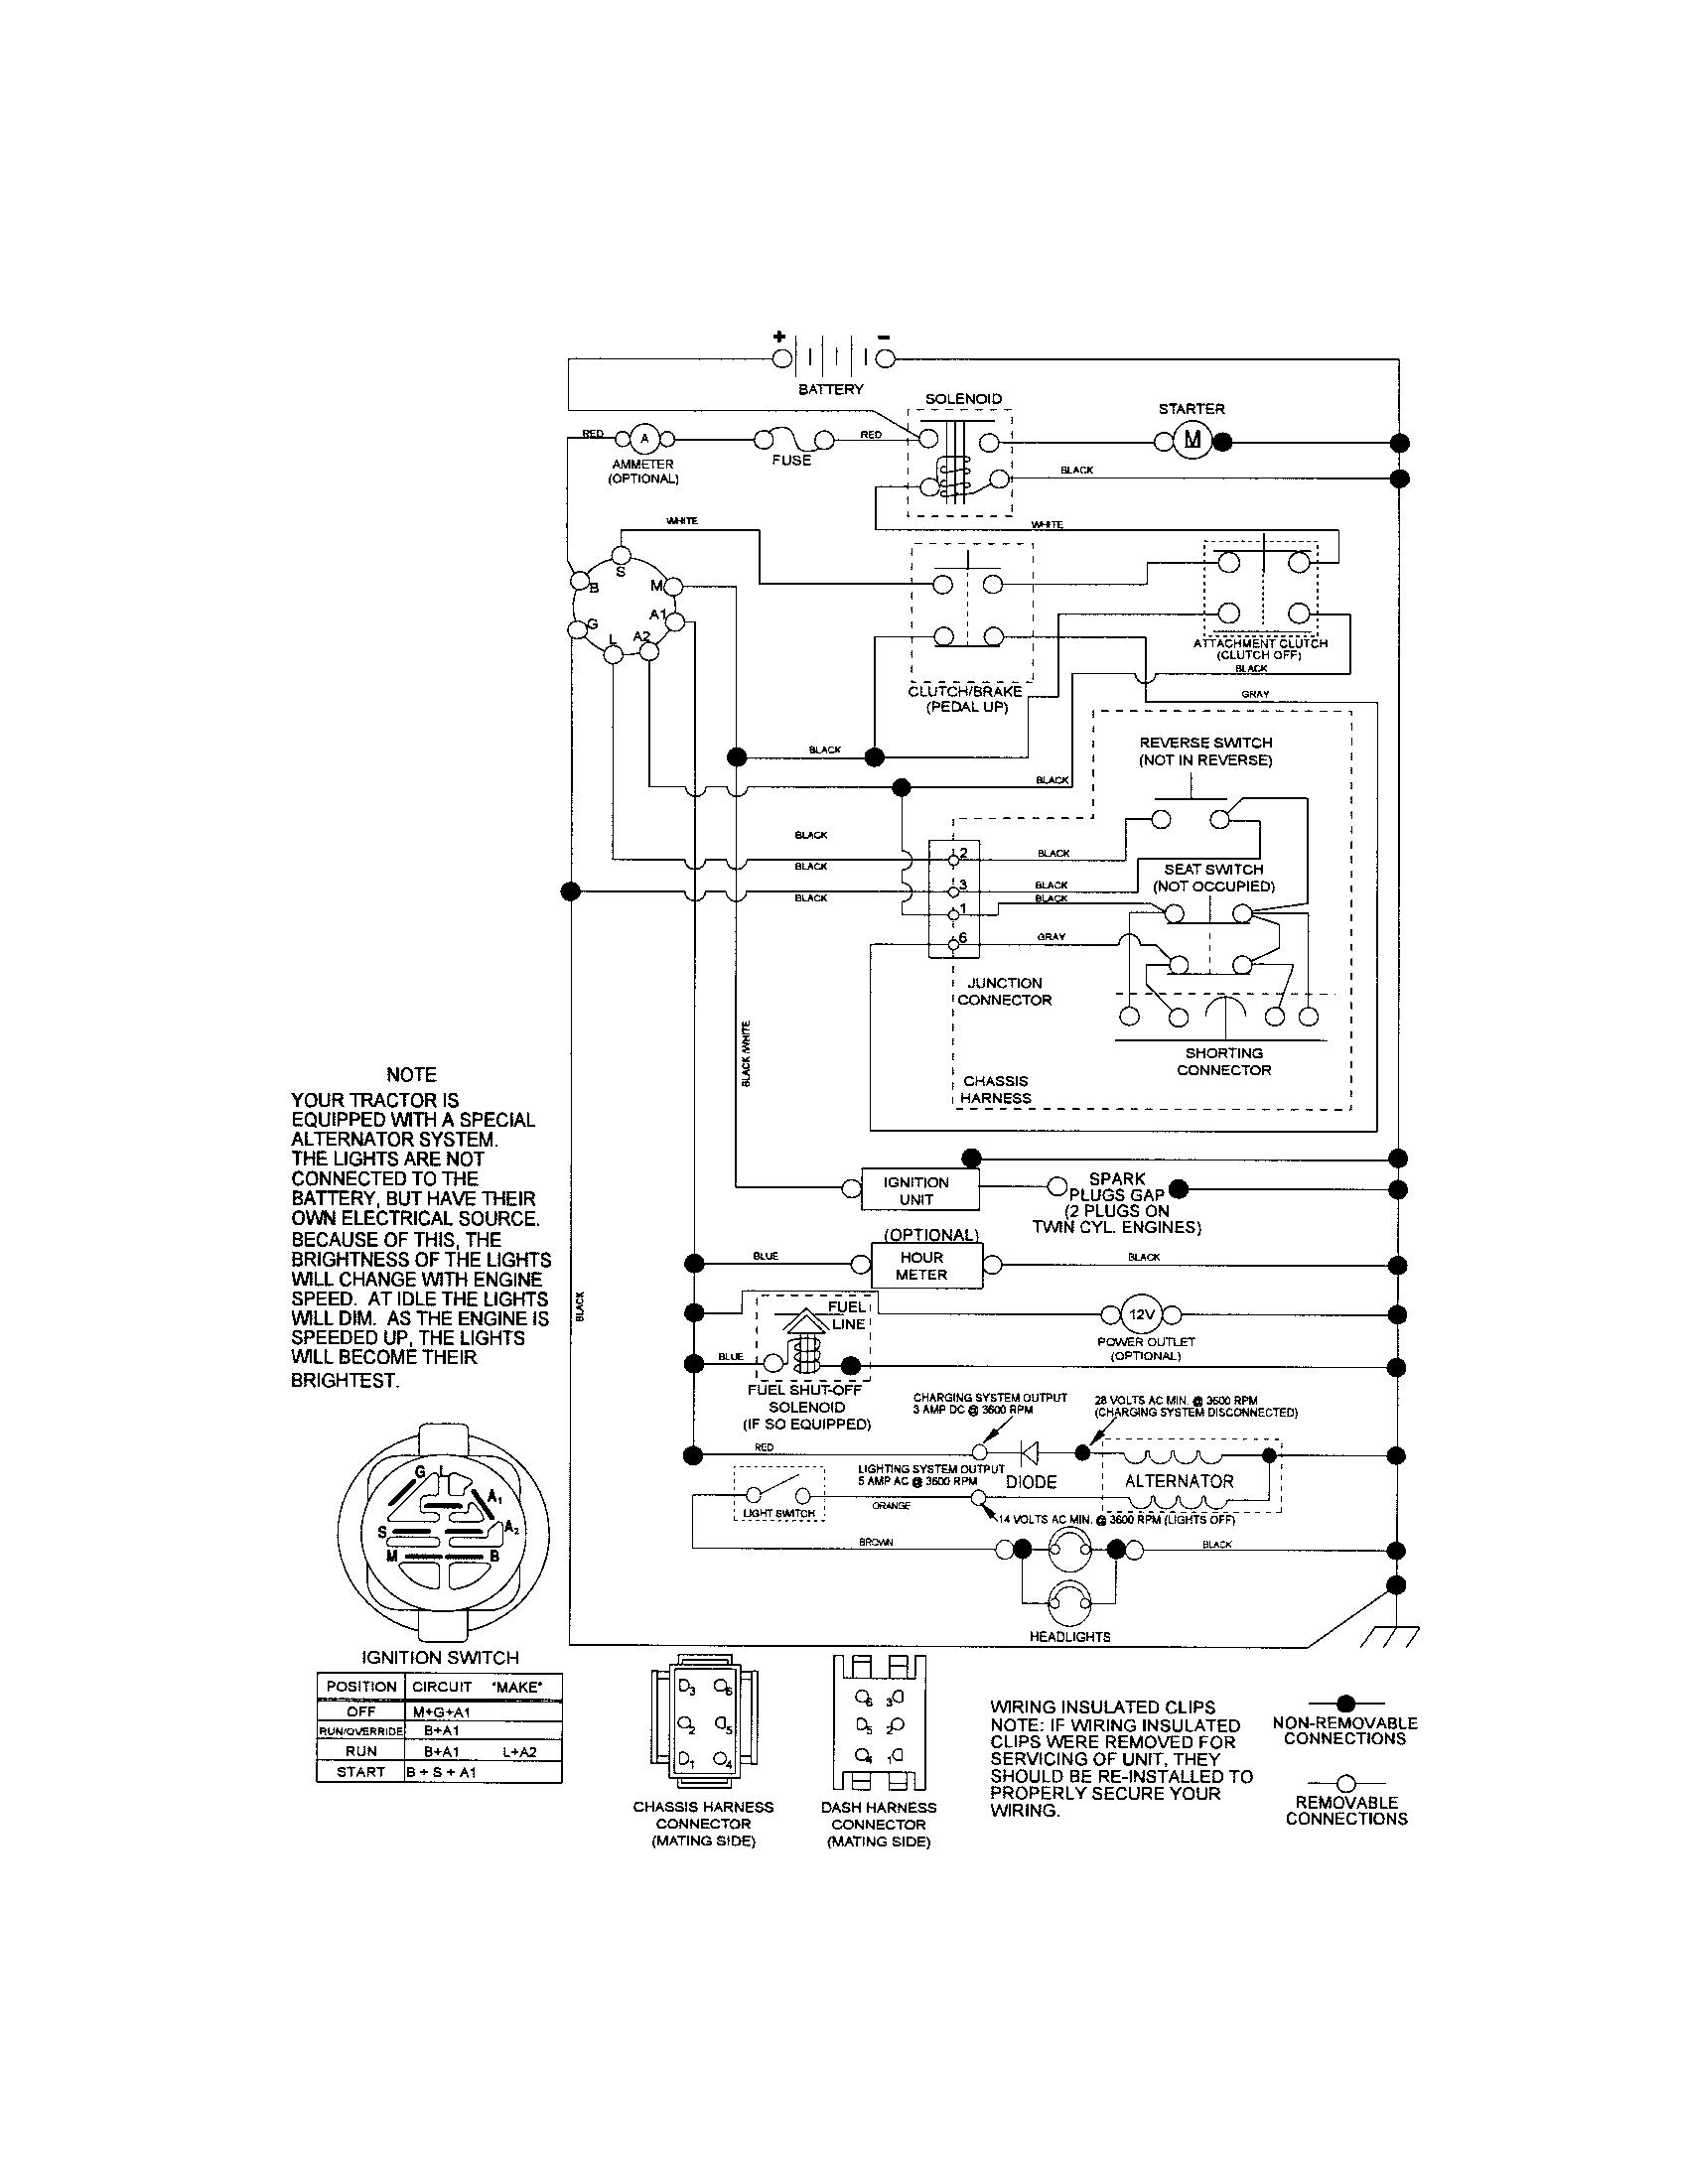 hight resolution of craftsman 917287130 schematic diagram tractor diagram